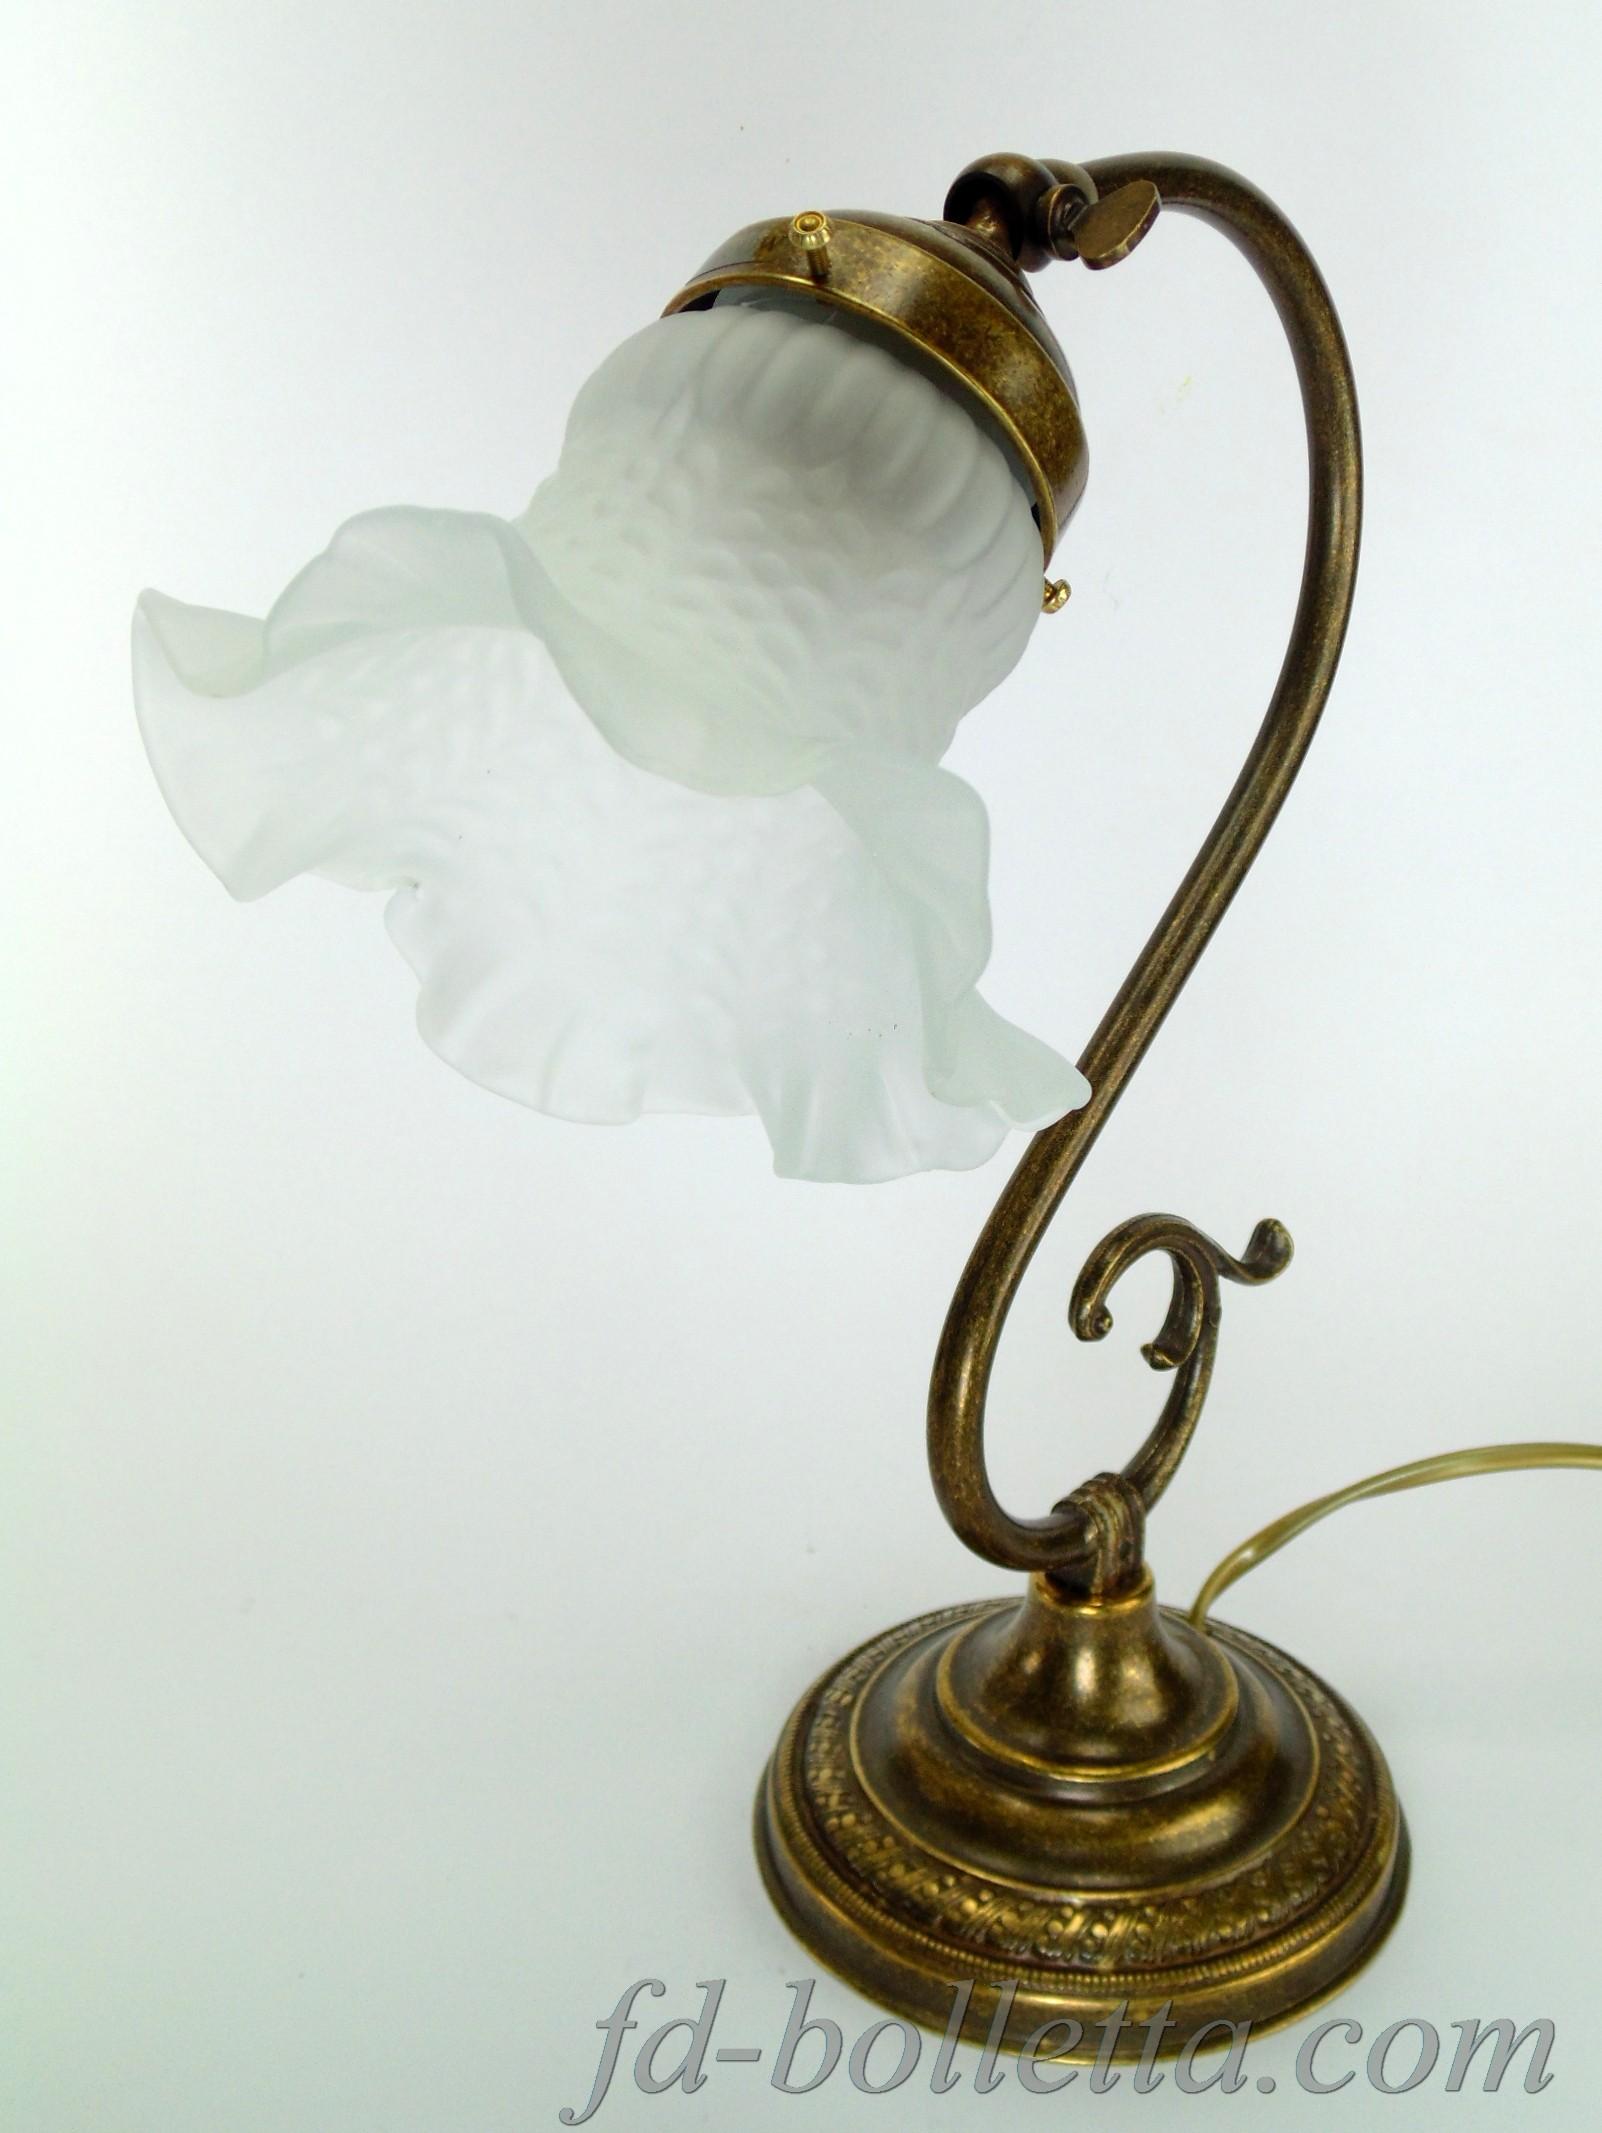 Lampade Da Tavolo Liberty : Lampada da tavolo stile liberty s fd bolletta lampade